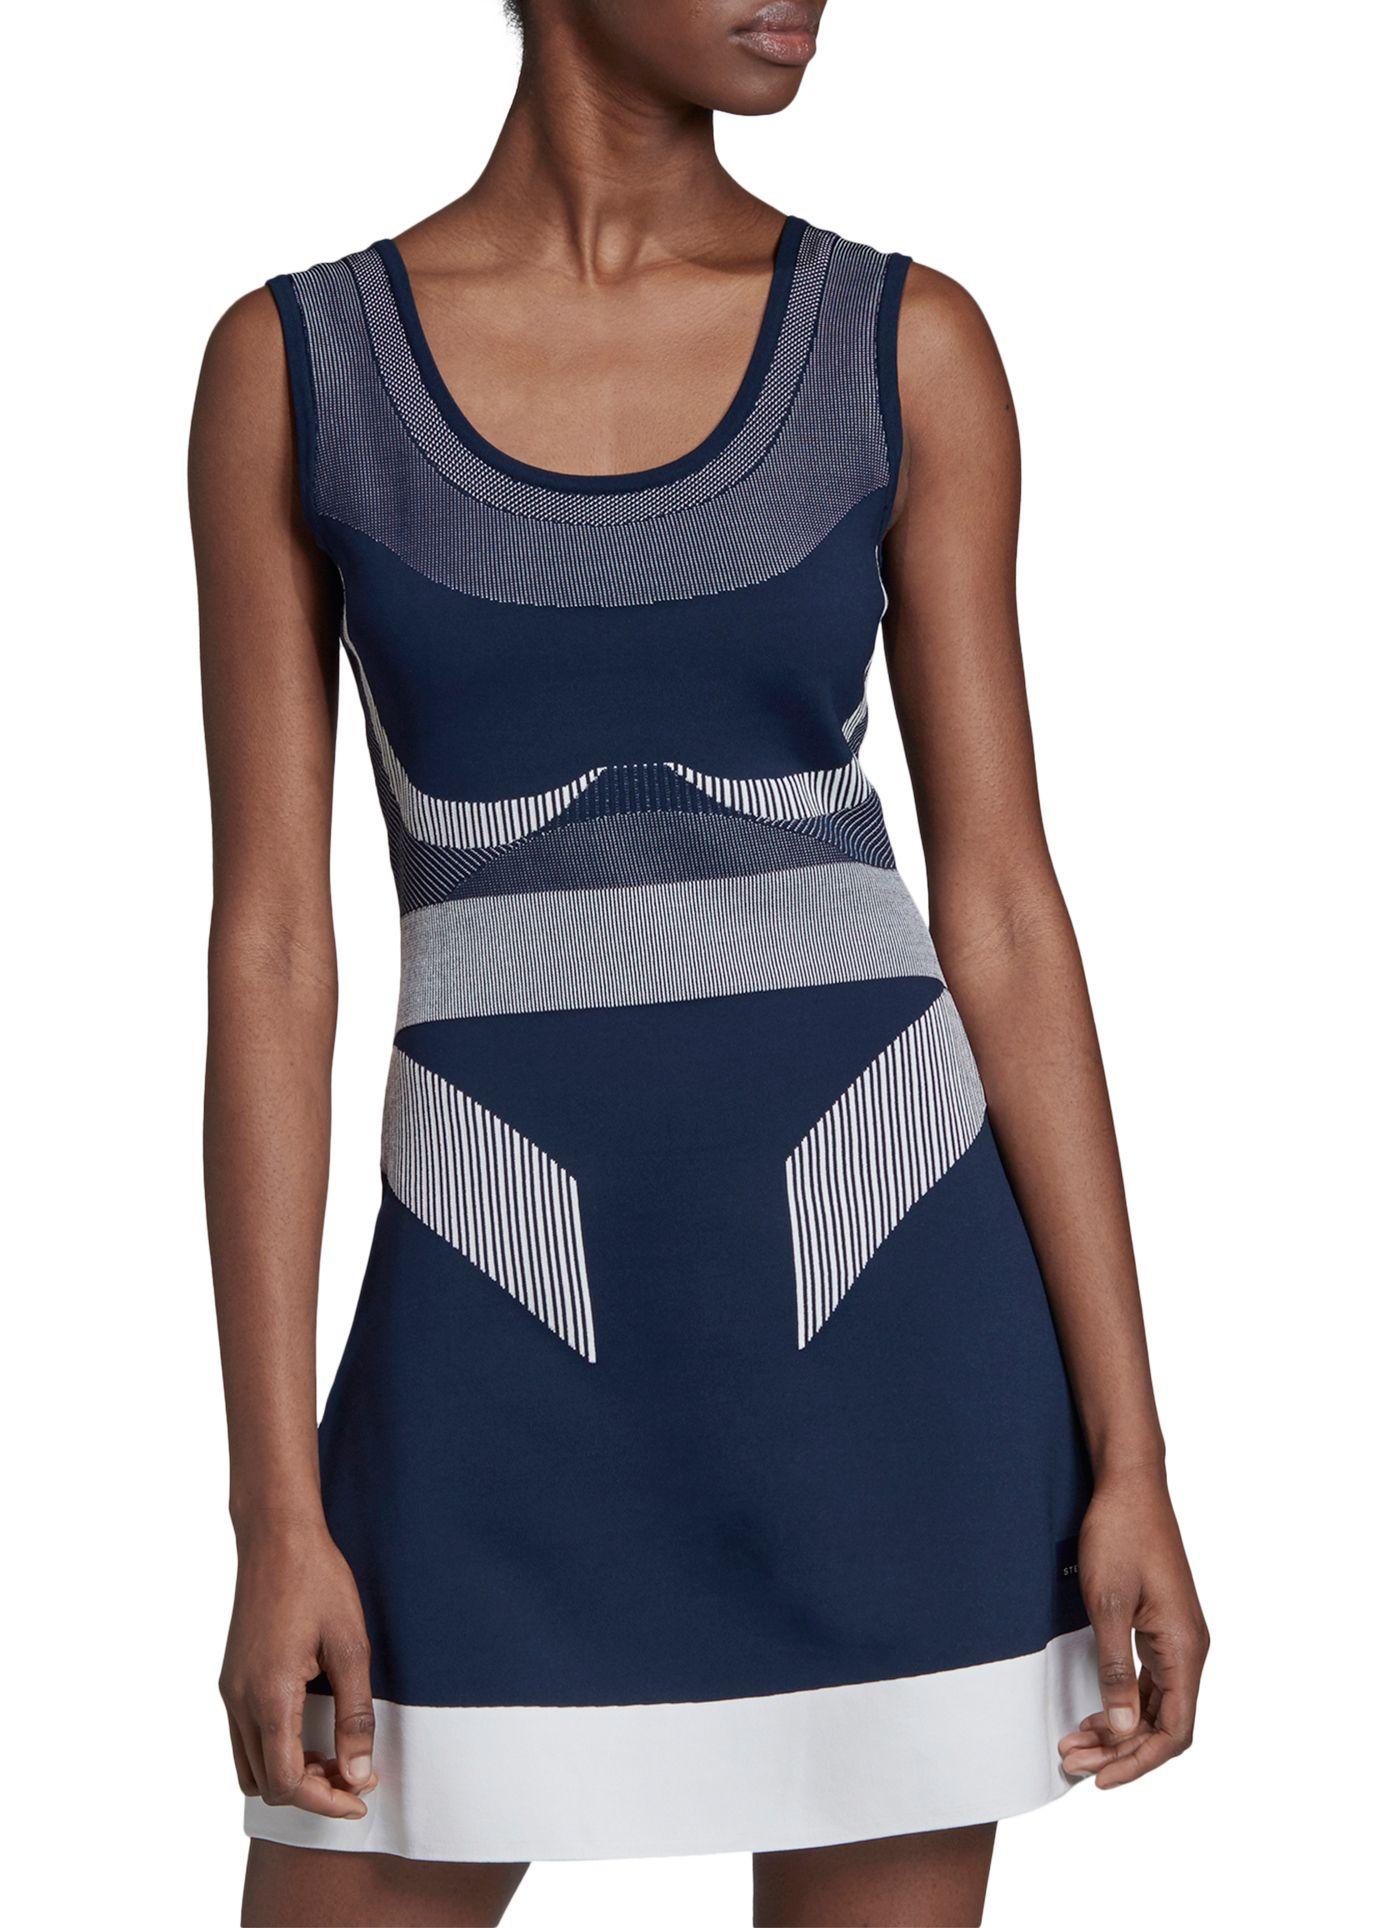 adidas Women's Stella McCartney Court Clubhouse Tennis Dress